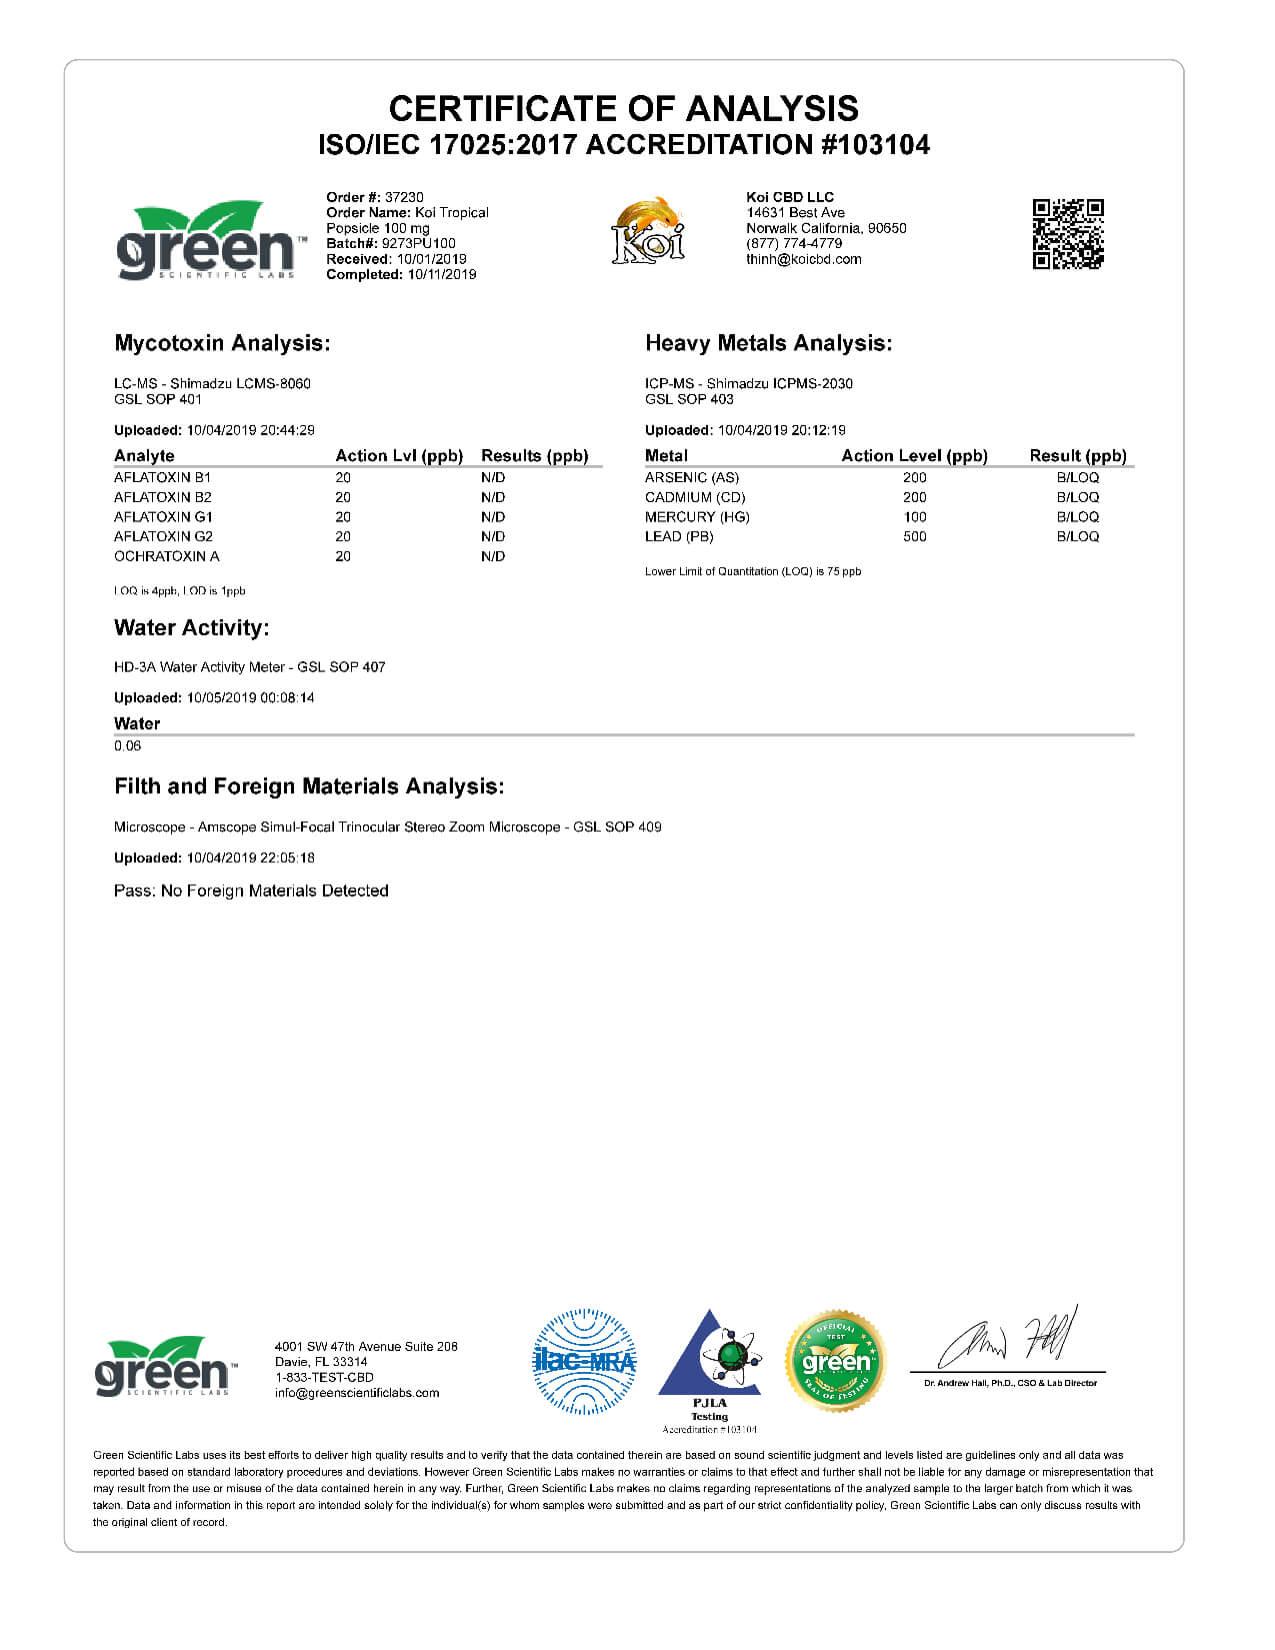 Koi CBD Tropical Popsicle Vape Oil 100mg page6